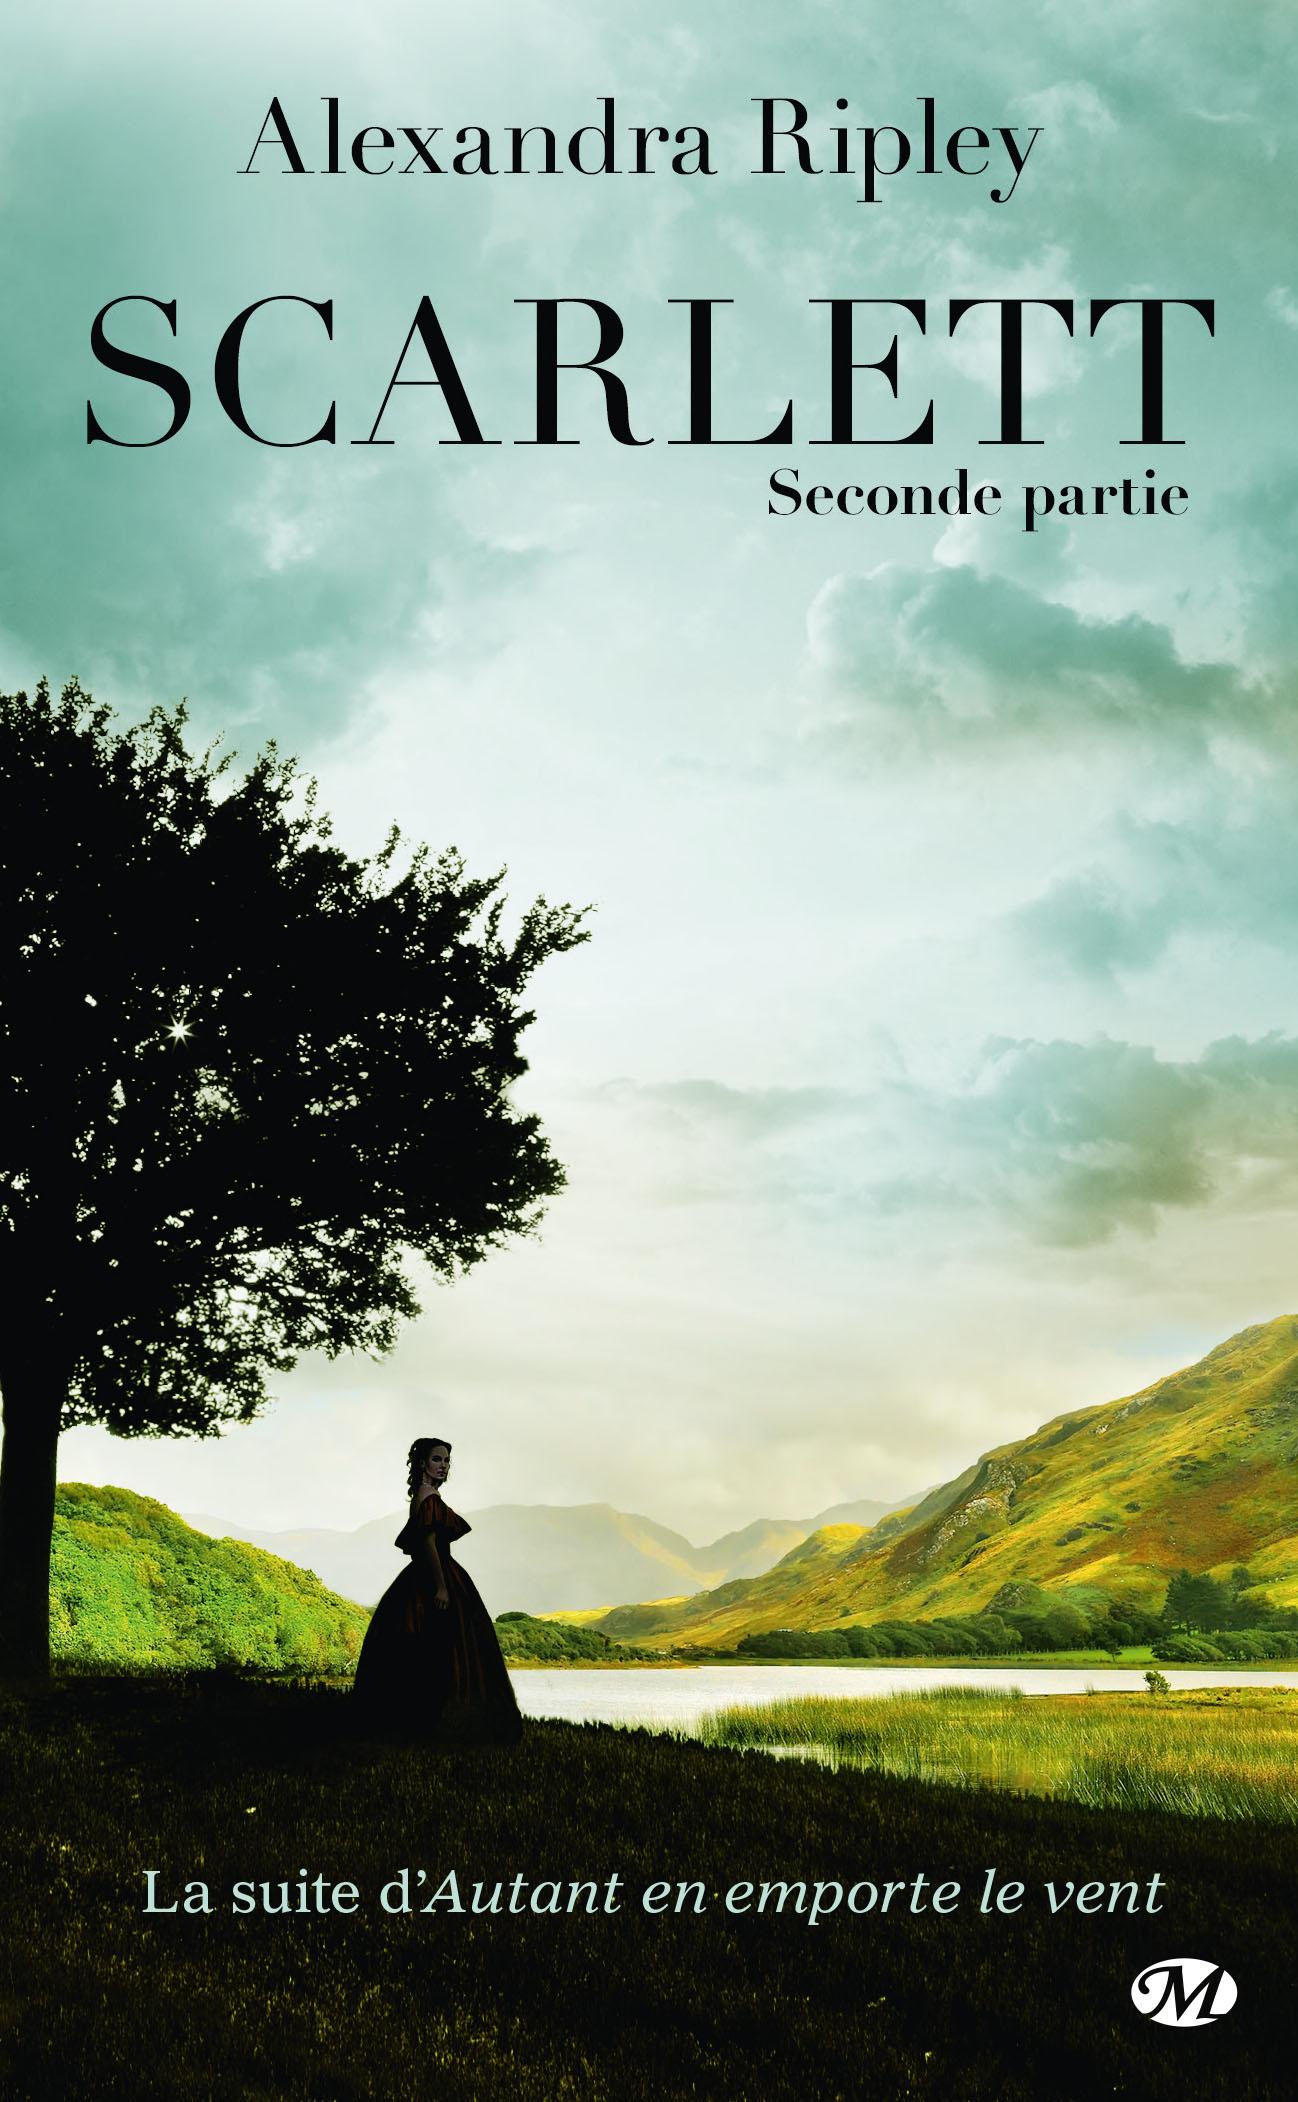 Scarlett de Alexandra Ripley 9782811224509_org